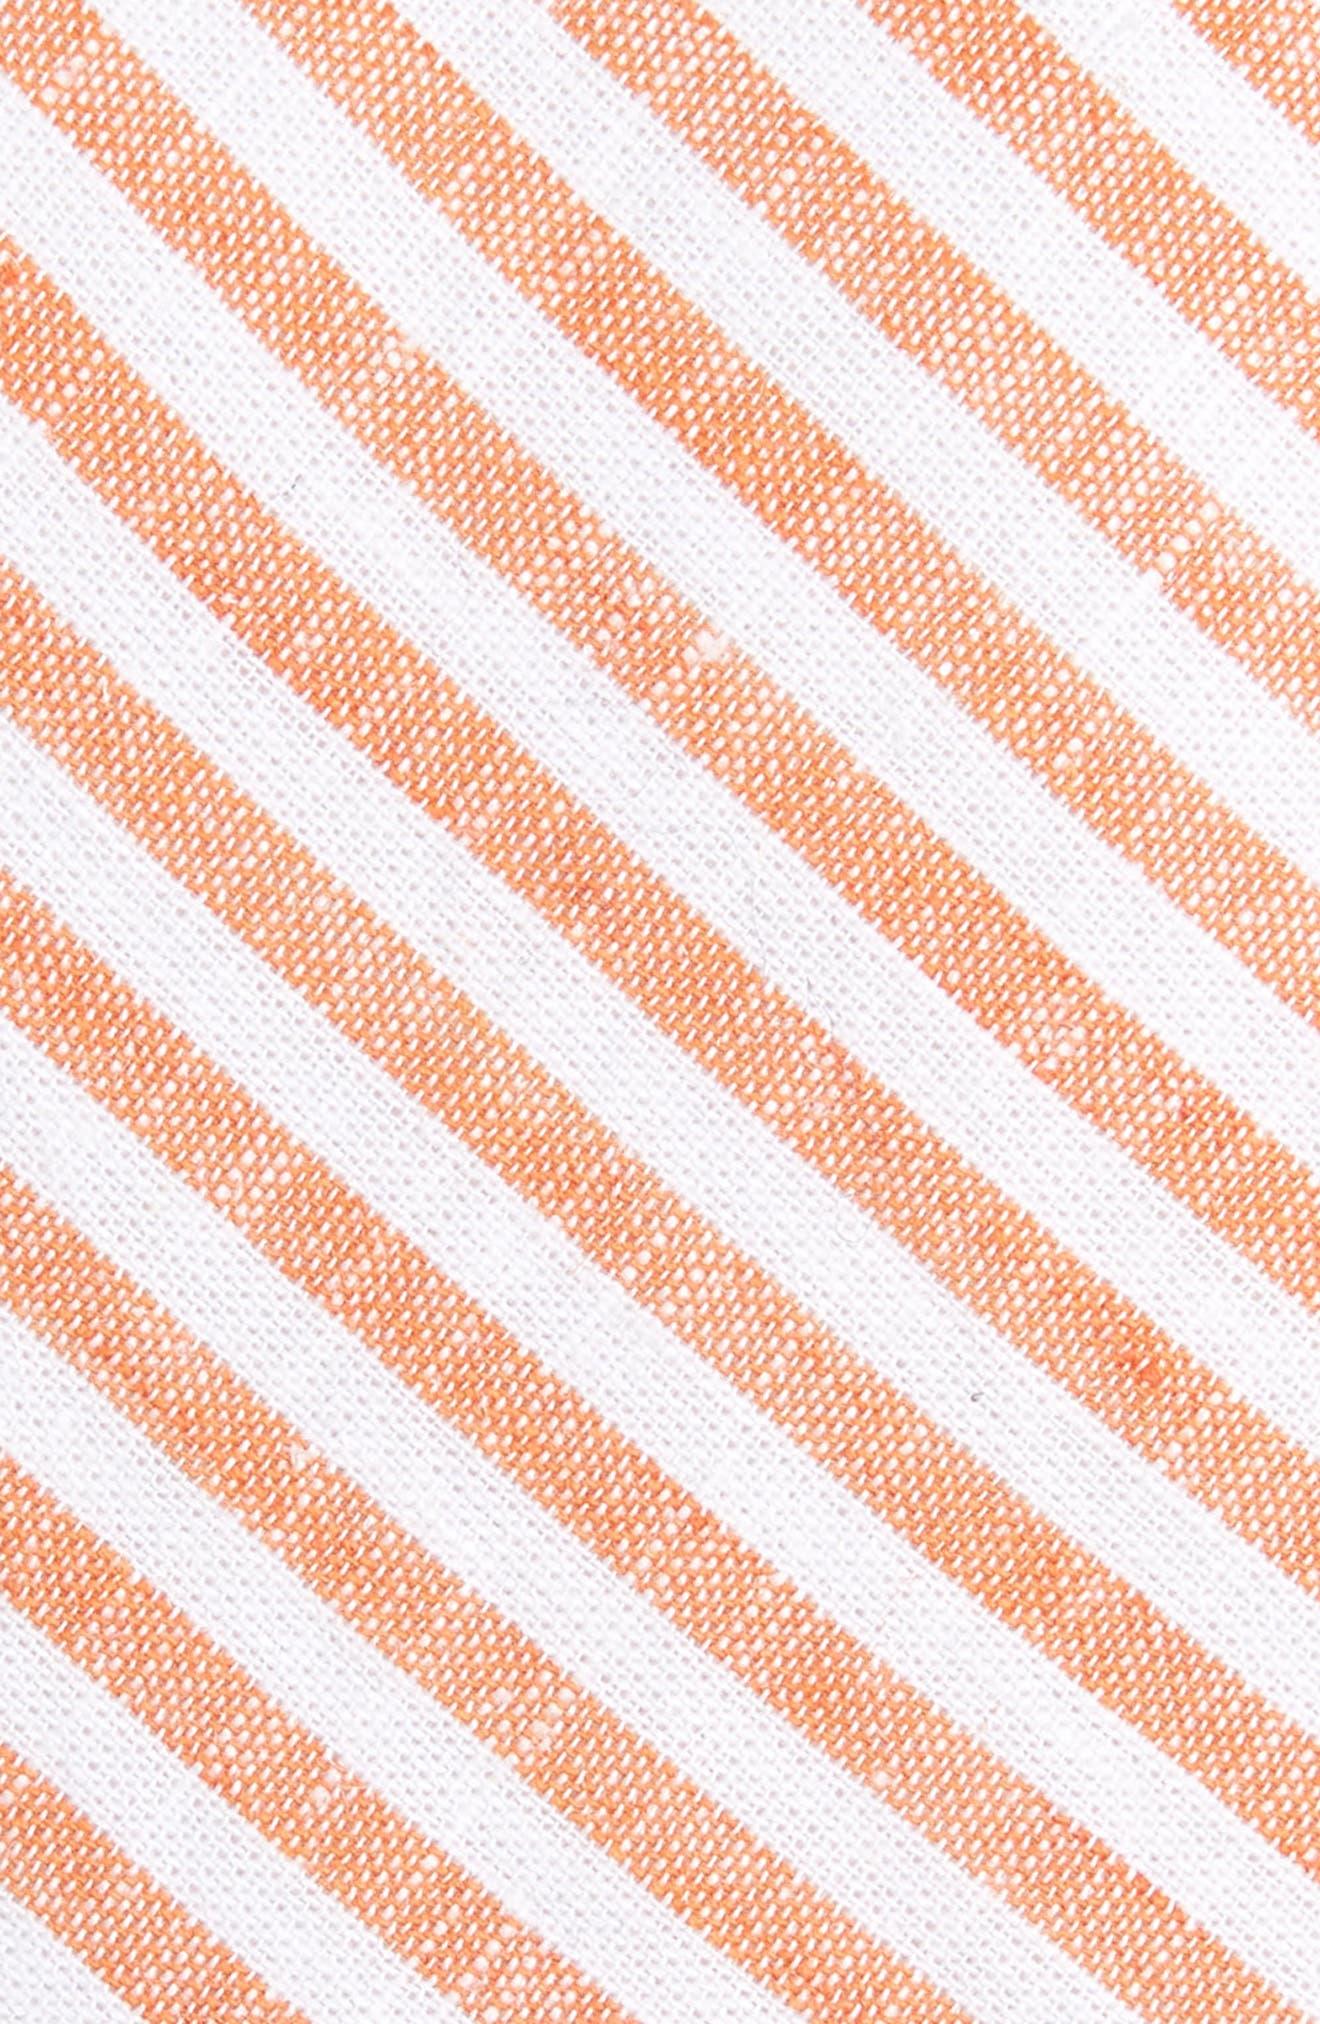 Telary Stripe Cotton Skinny Tie,                             Alternate thumbnail 2, color,                             Orange